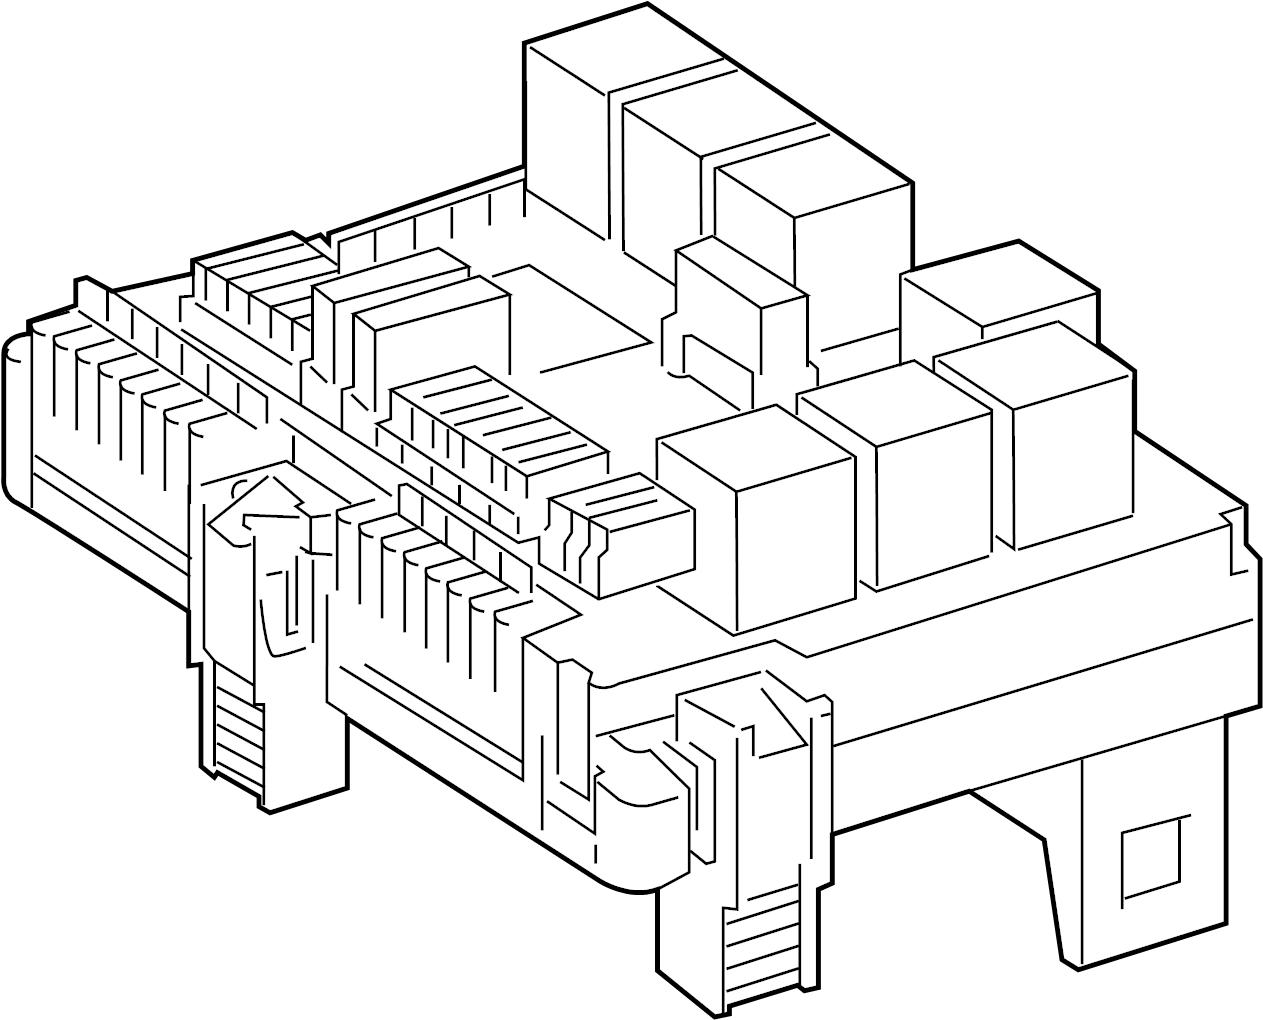 2008 cl550 fuse box